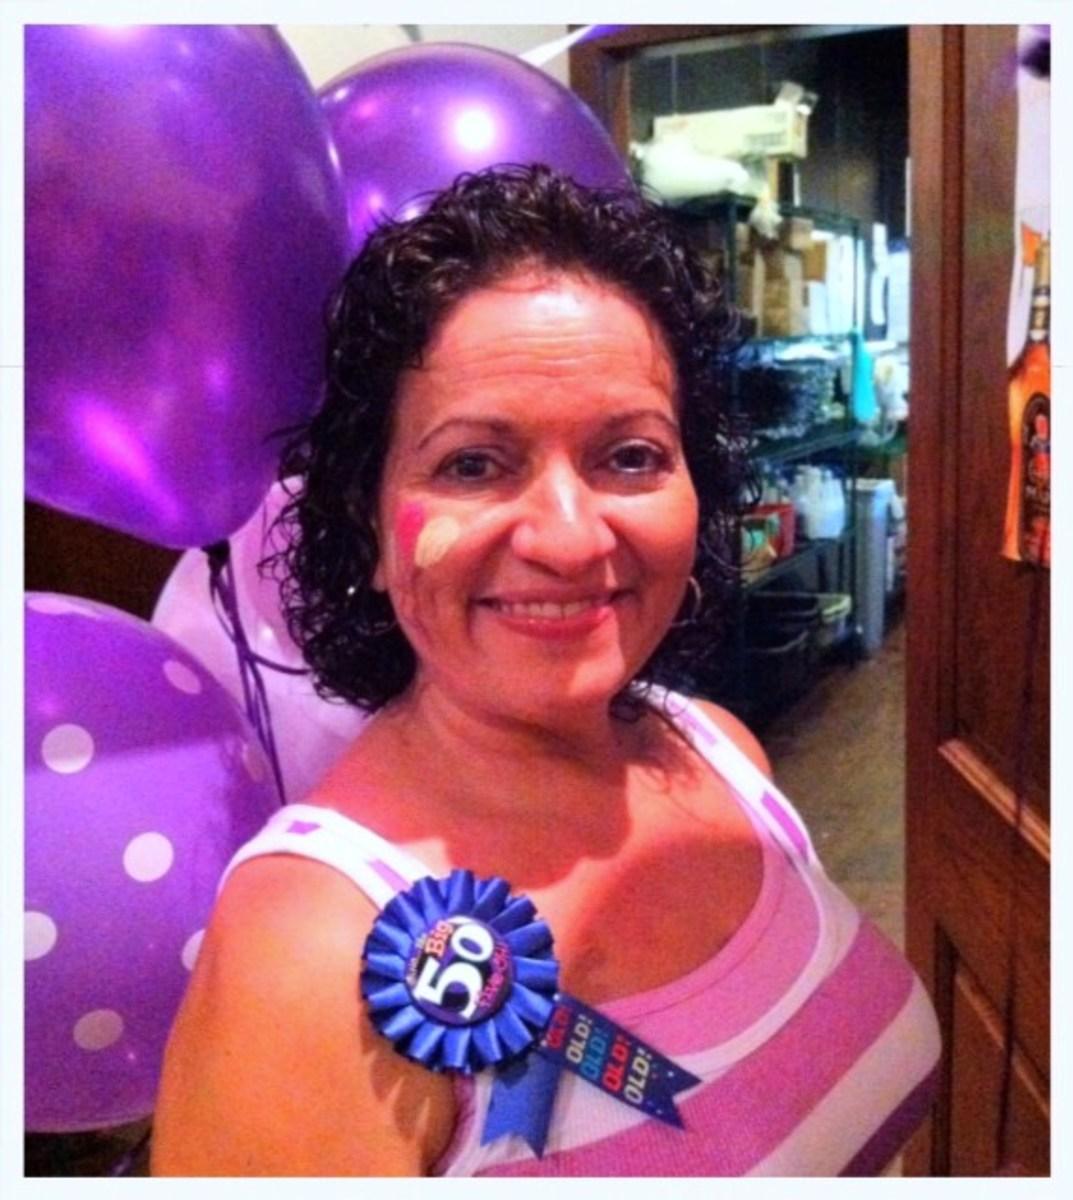 Happy 50th Birthday to me!